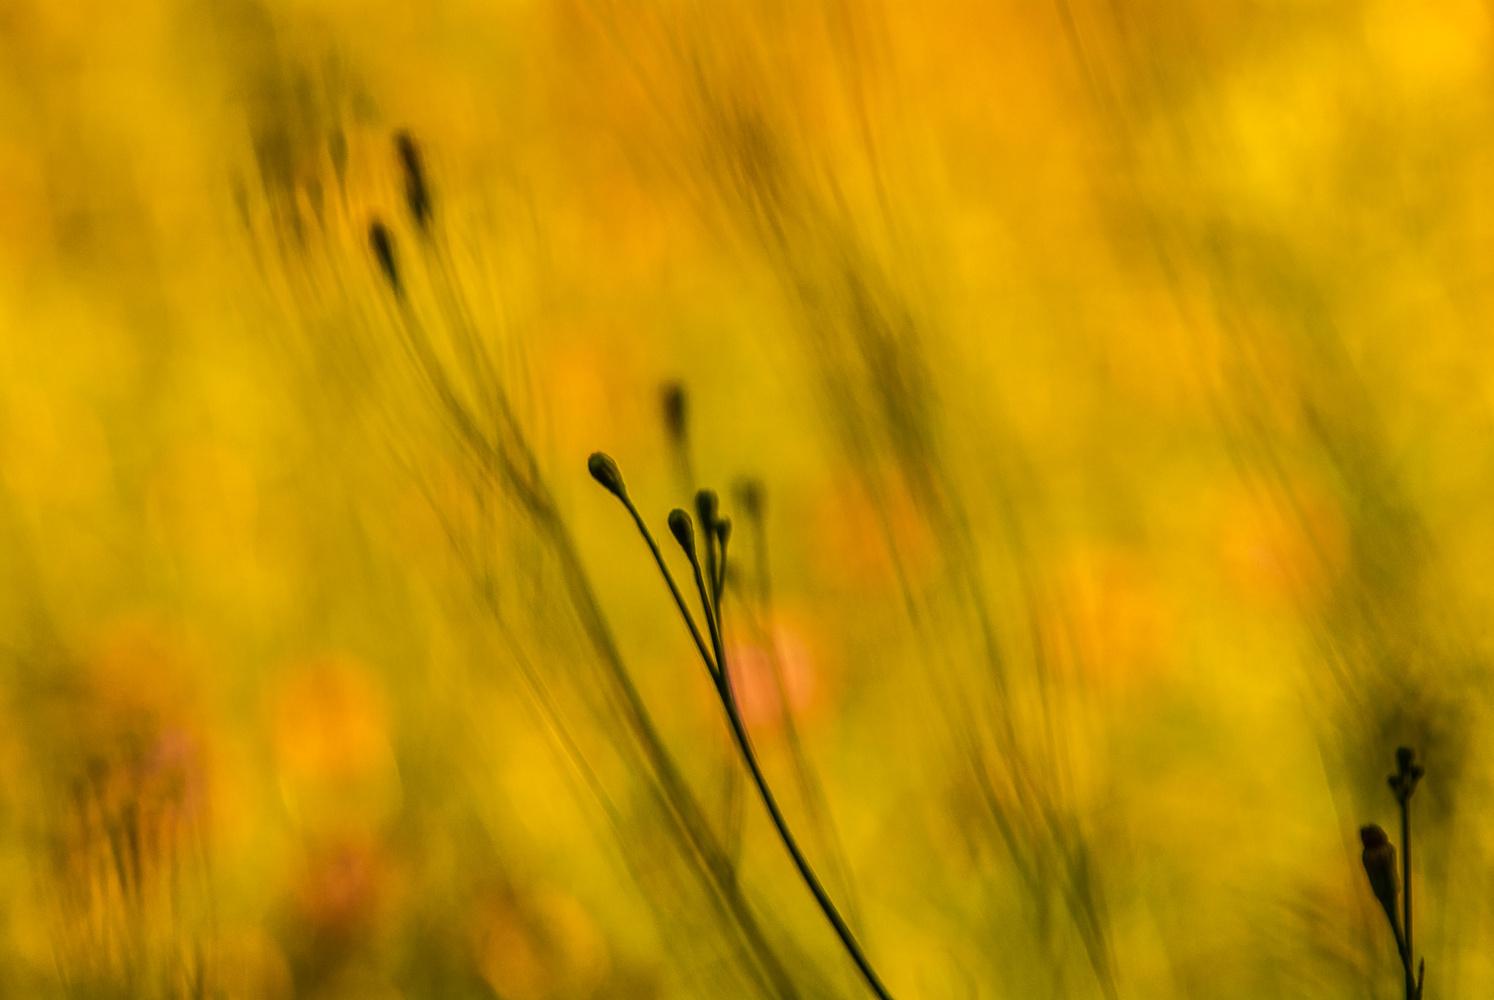 Meadow Art by David Peruzzini